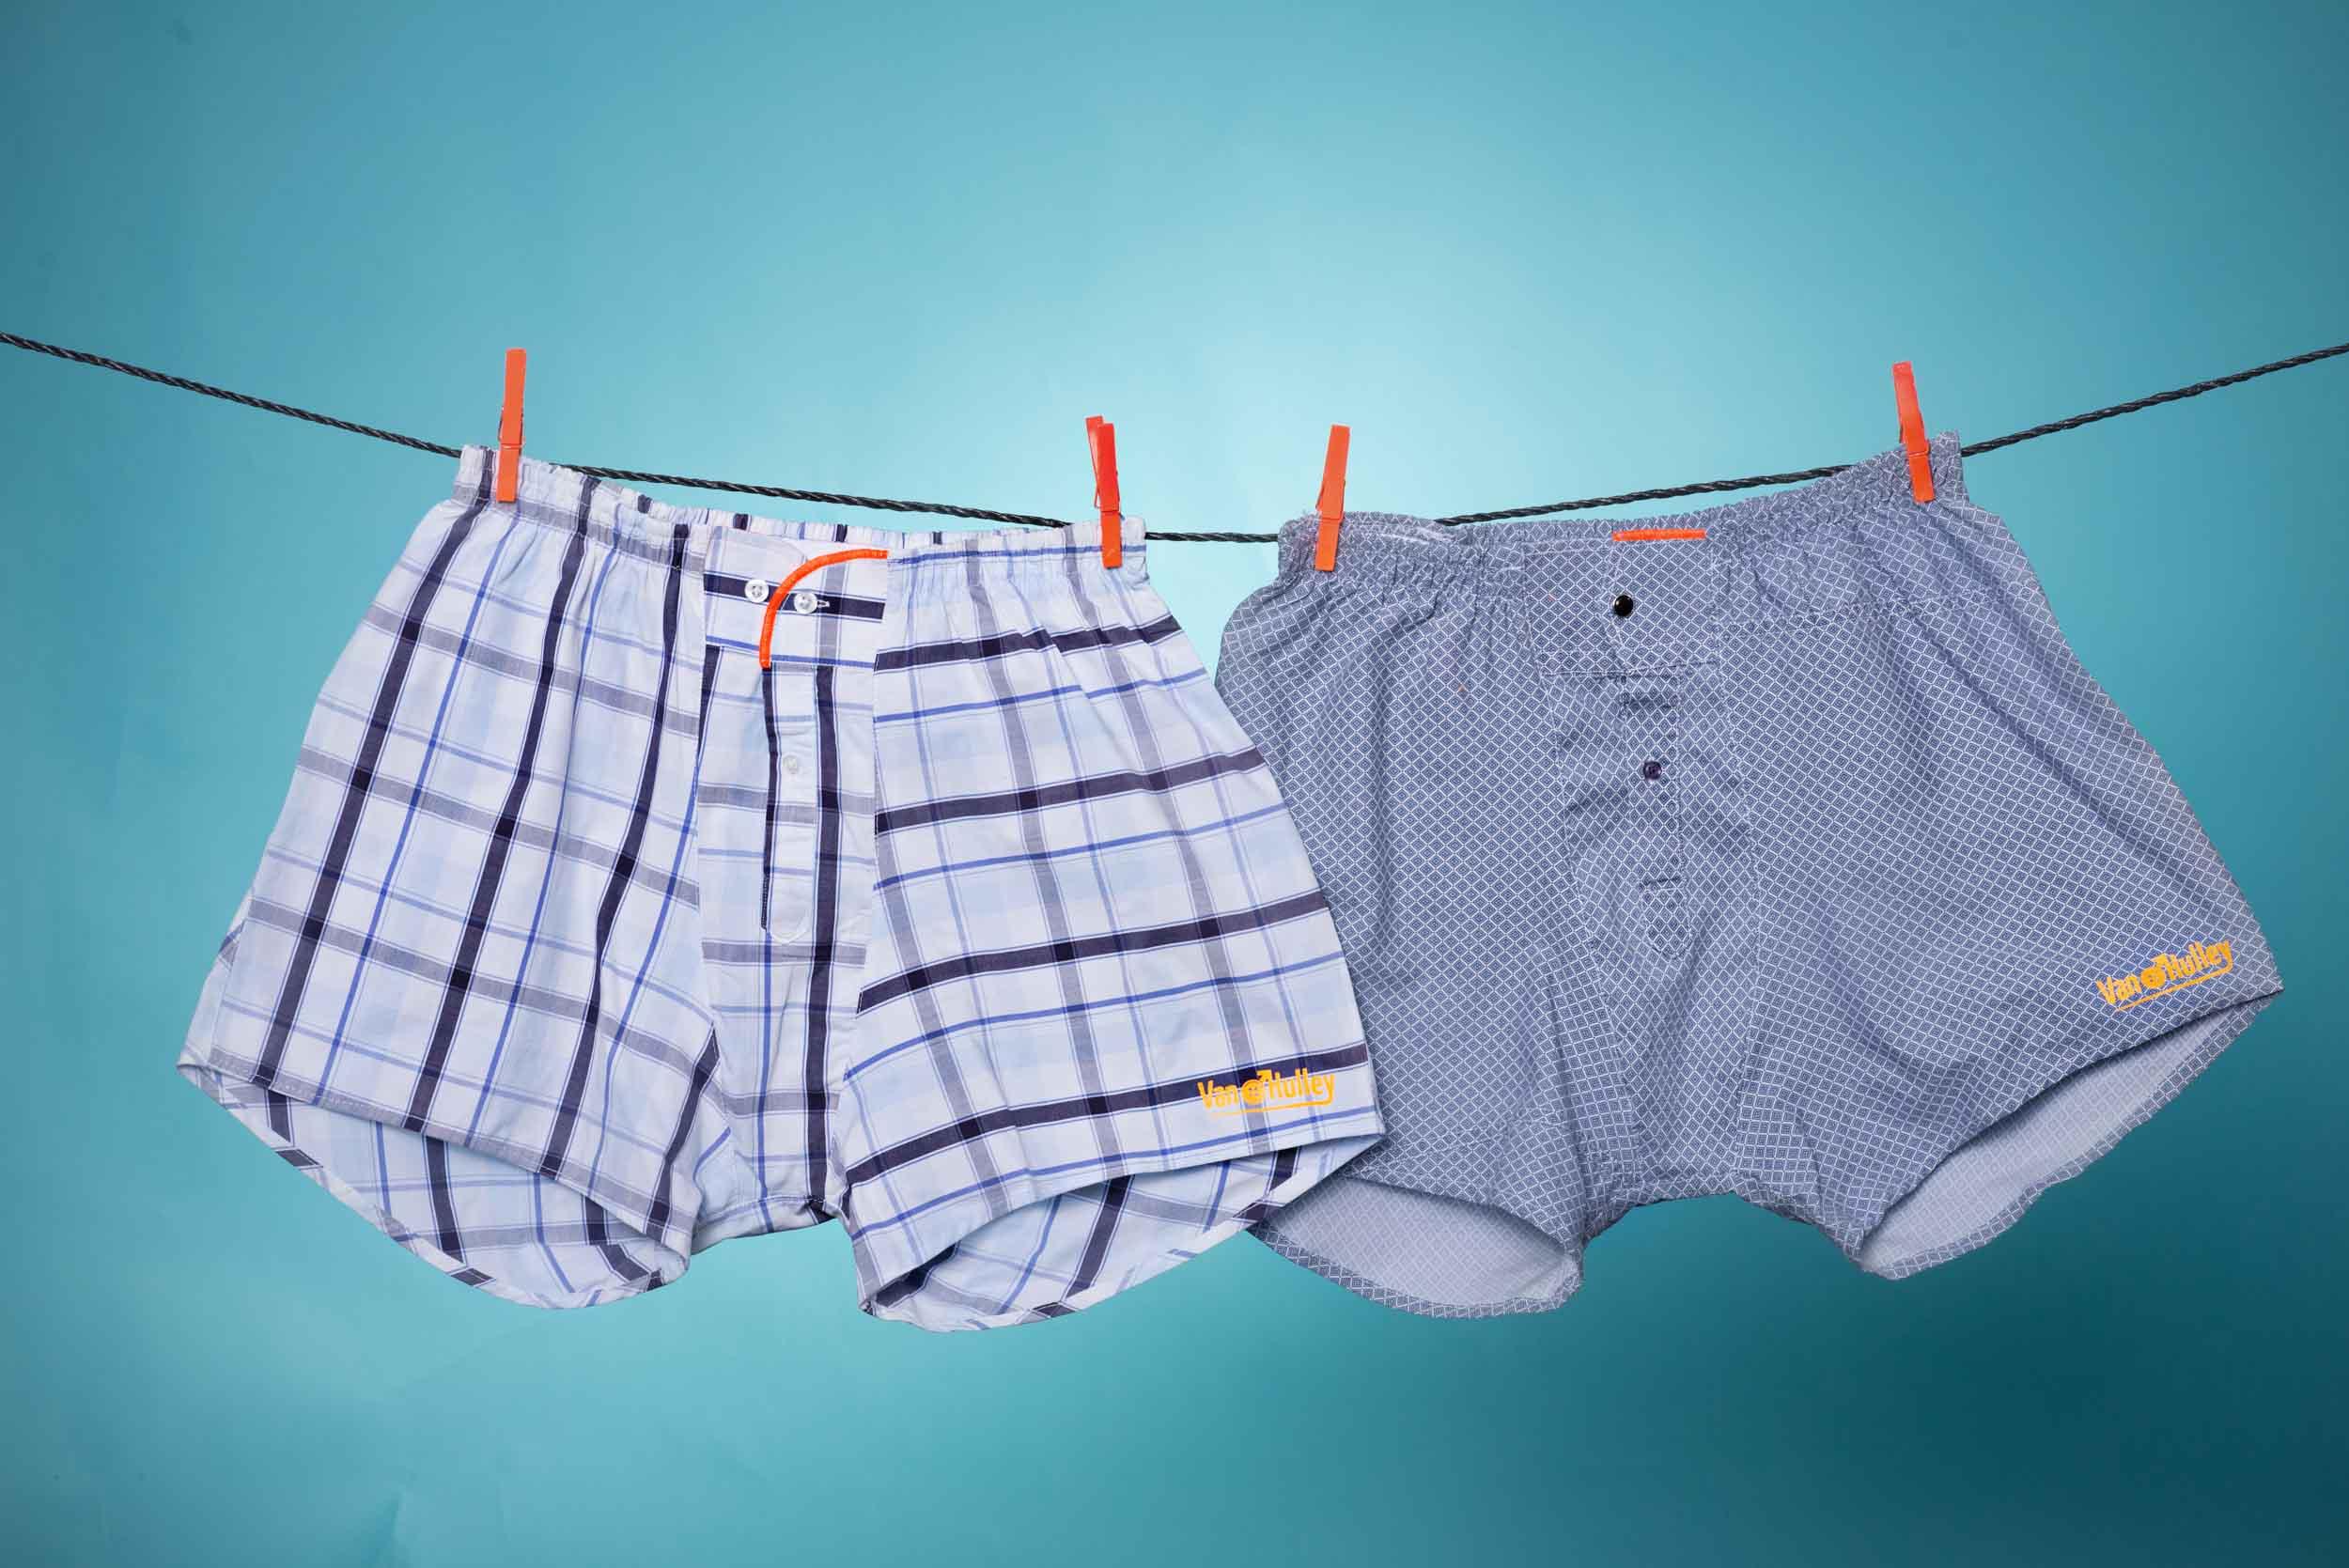 Upcycled old shirts into shorts!